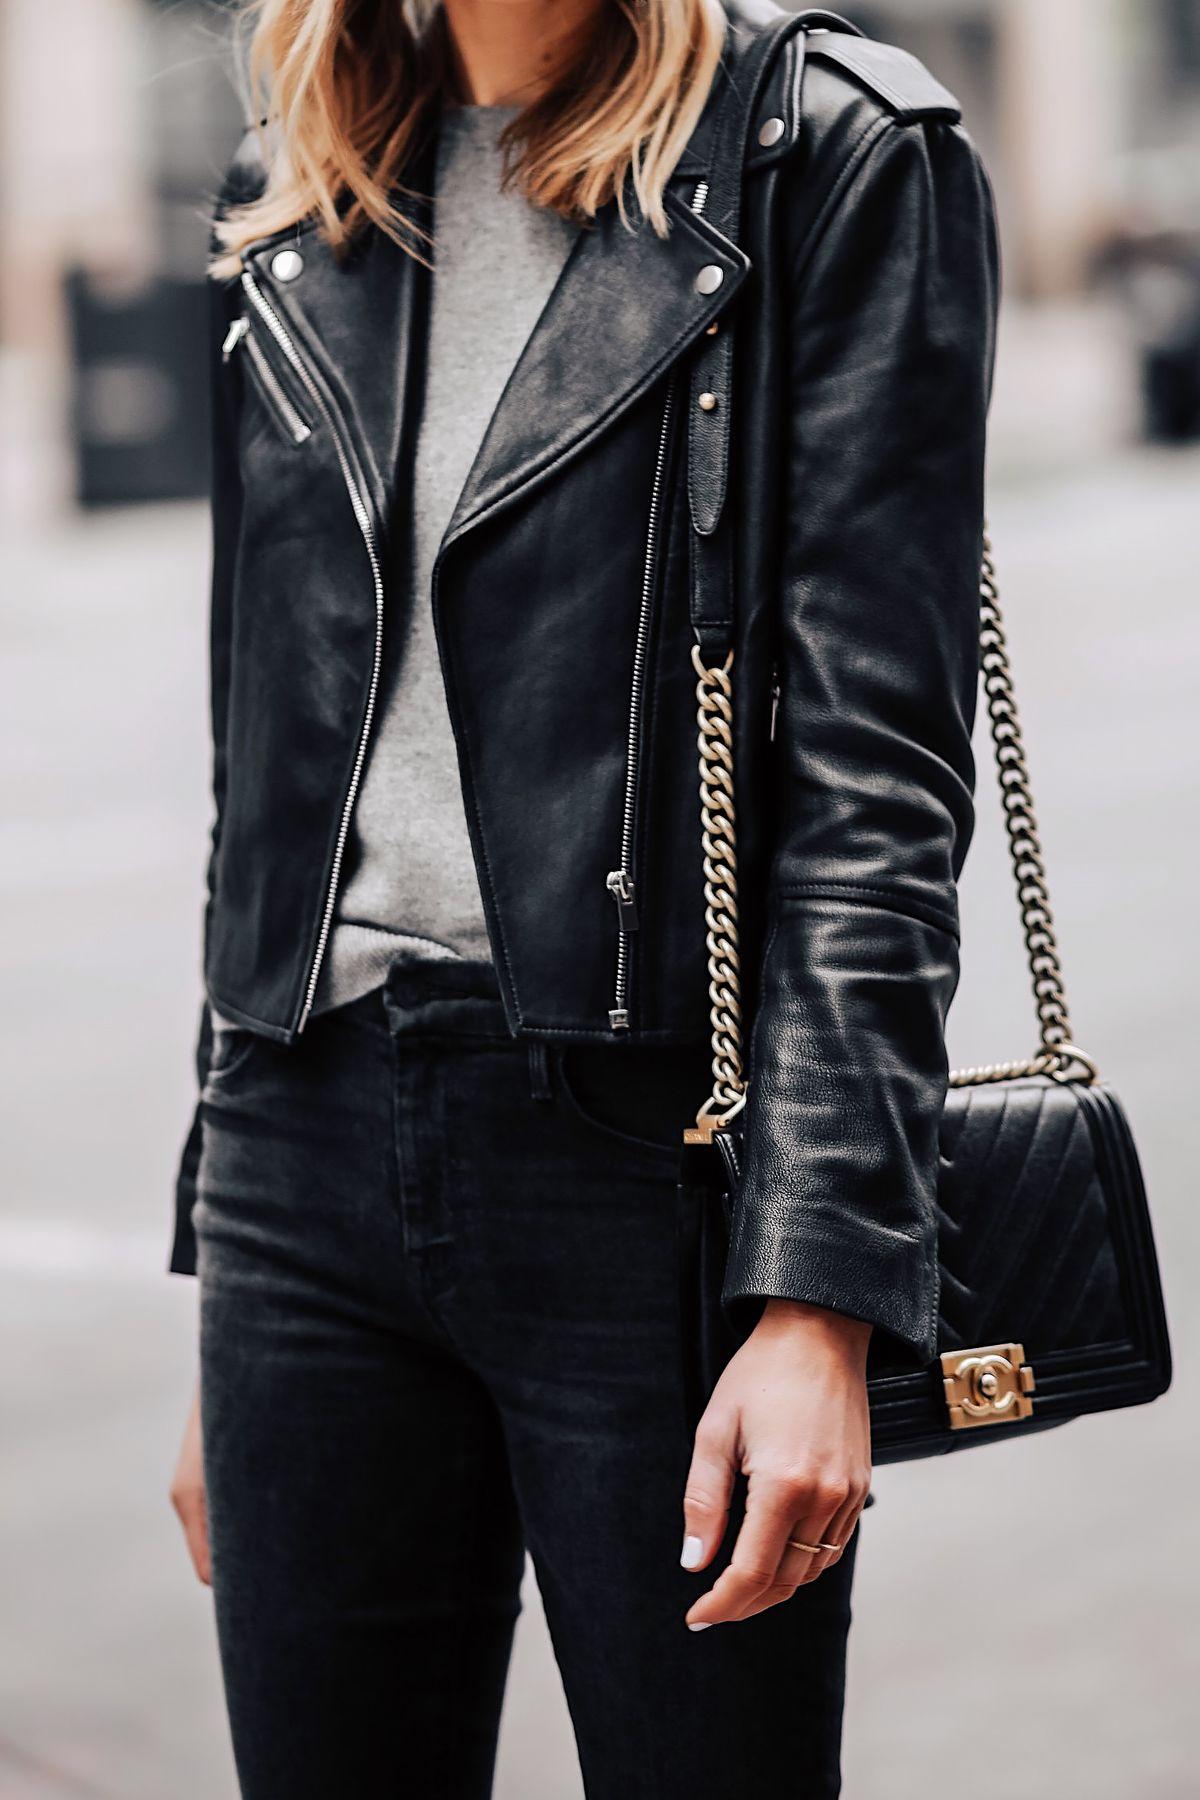 941c50ff264 Blonde Woman Wearing Club Monaco Black Leather Jacket Grey Sweater Black  Skinny Jeans Chanel Black Boy Bag Fashion Jackson San Diego Fashion Blogger  Street ...